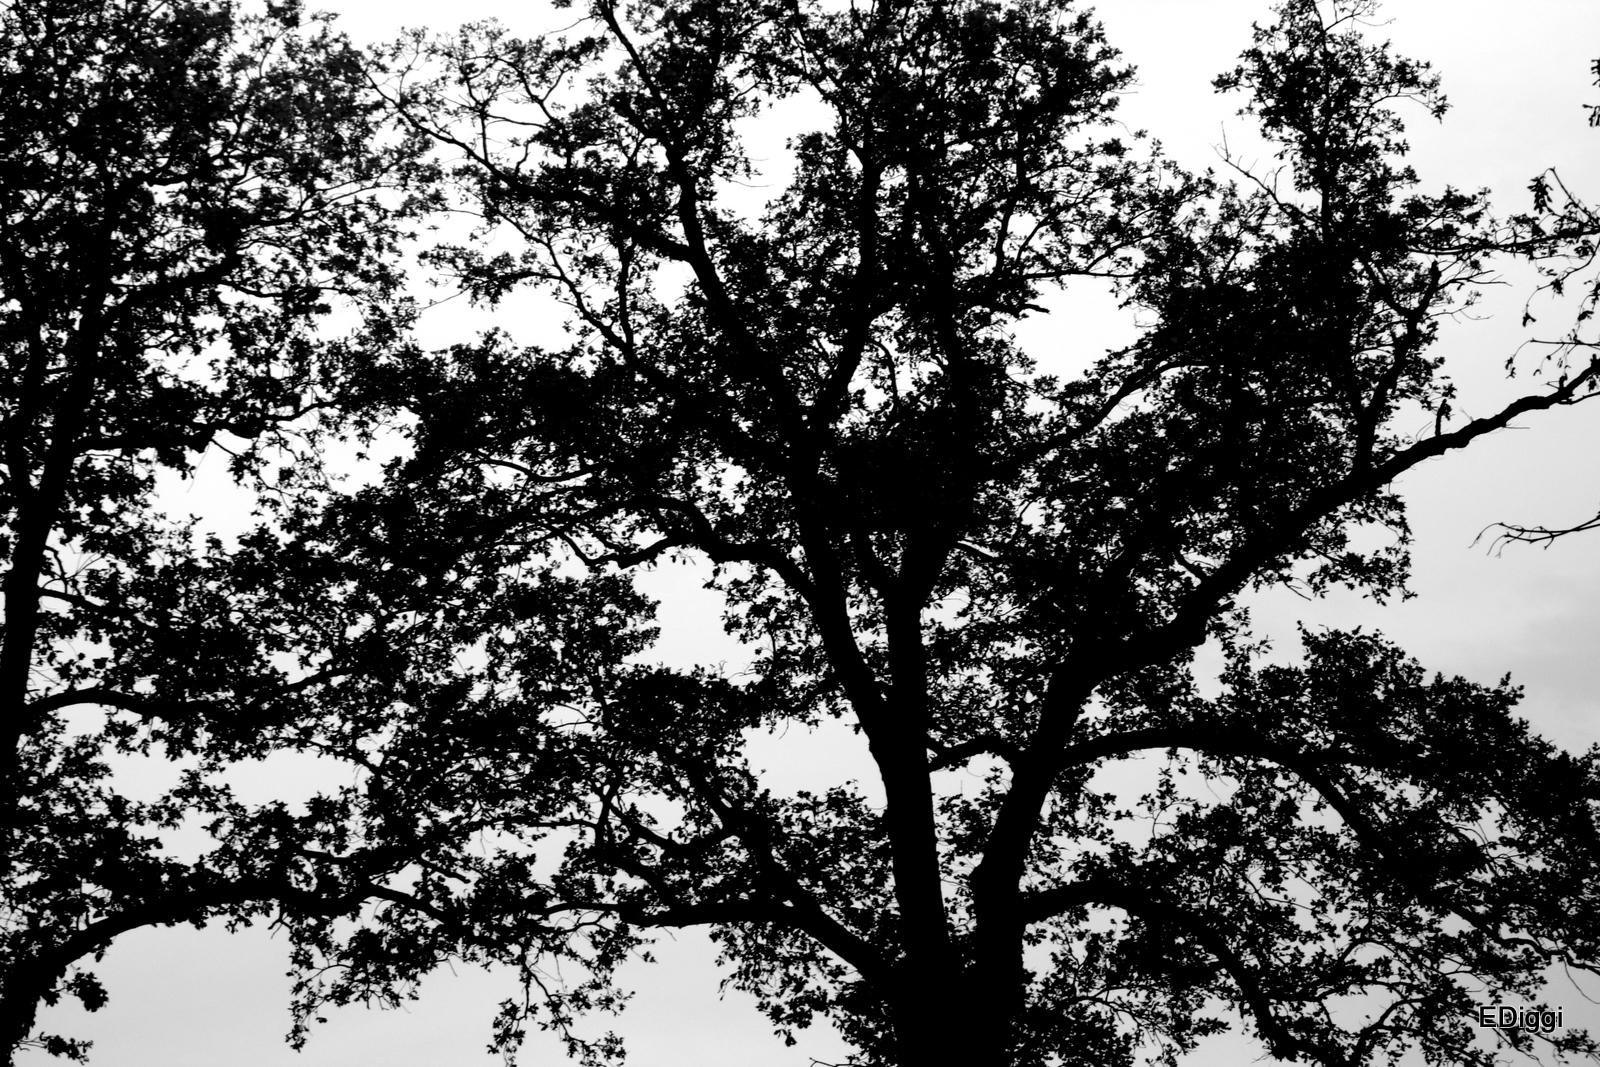 herbst in schwarz wei foto bild pflanzen pilze flechten b ume baumrinden wurzeln. Black Bedroom Furniture Sets. Home Design Ideas